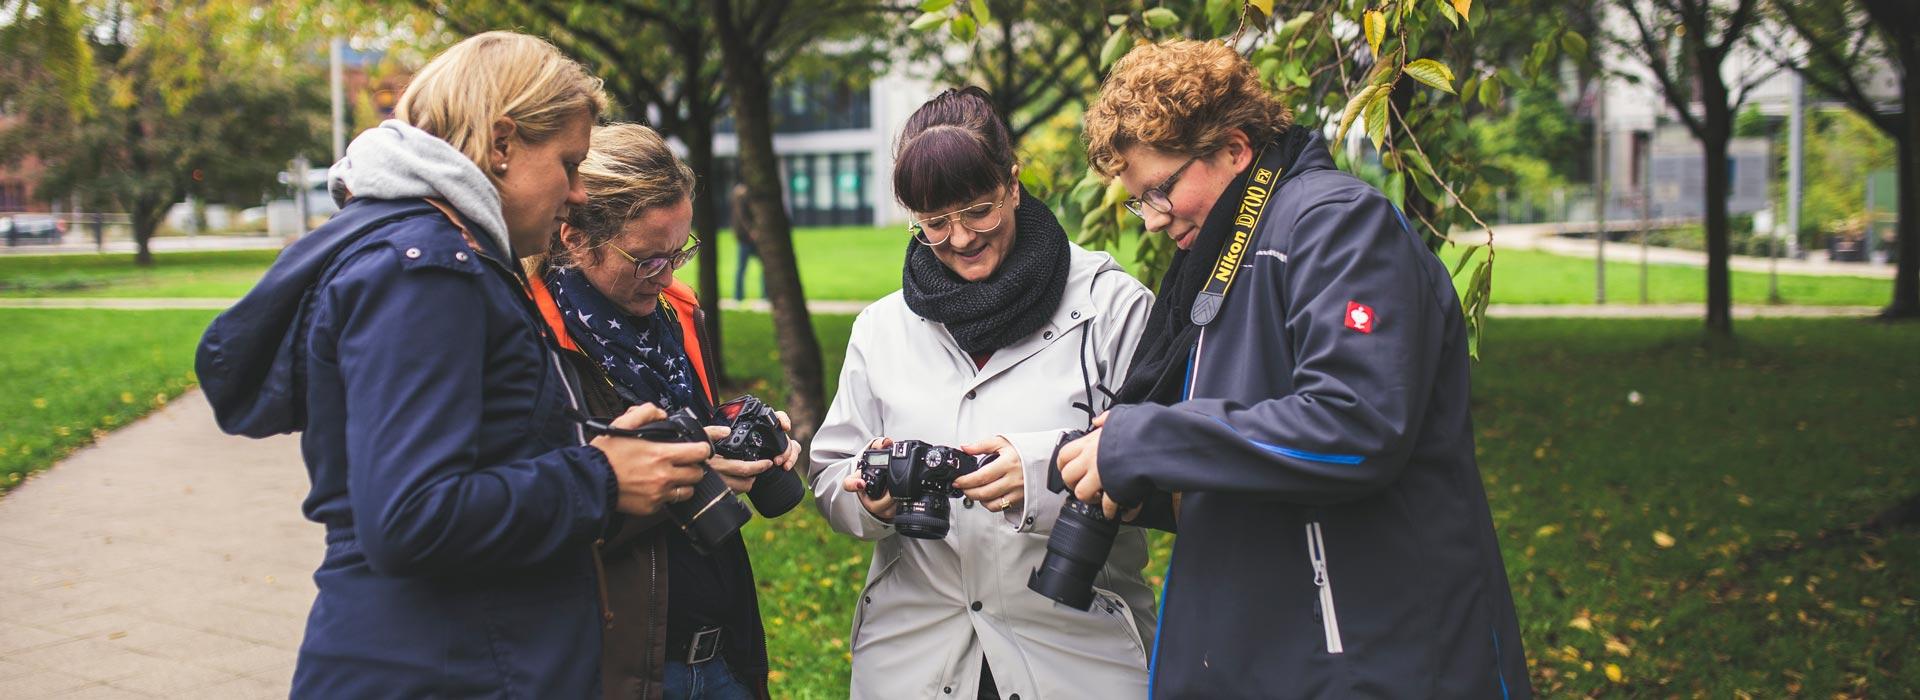 Fotokurs | Grundlagen 1 / Kameratechnik